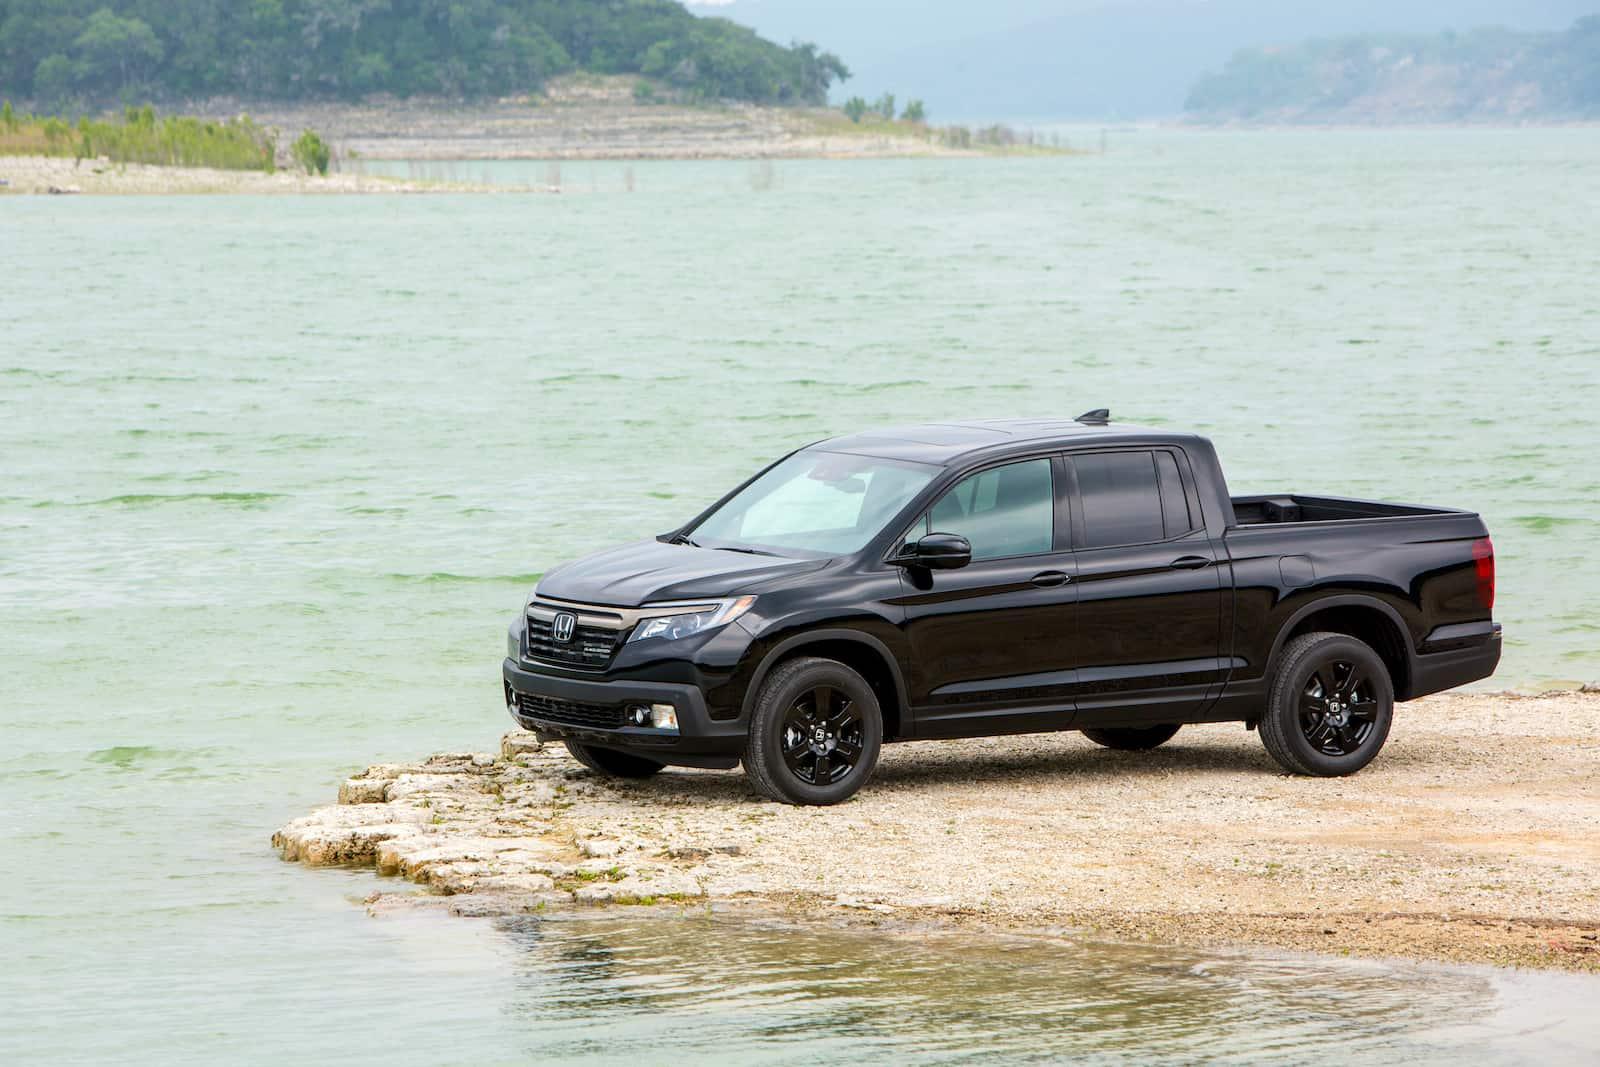 2017 Honda Ridgeline Black Edition Review: The Top-end Model